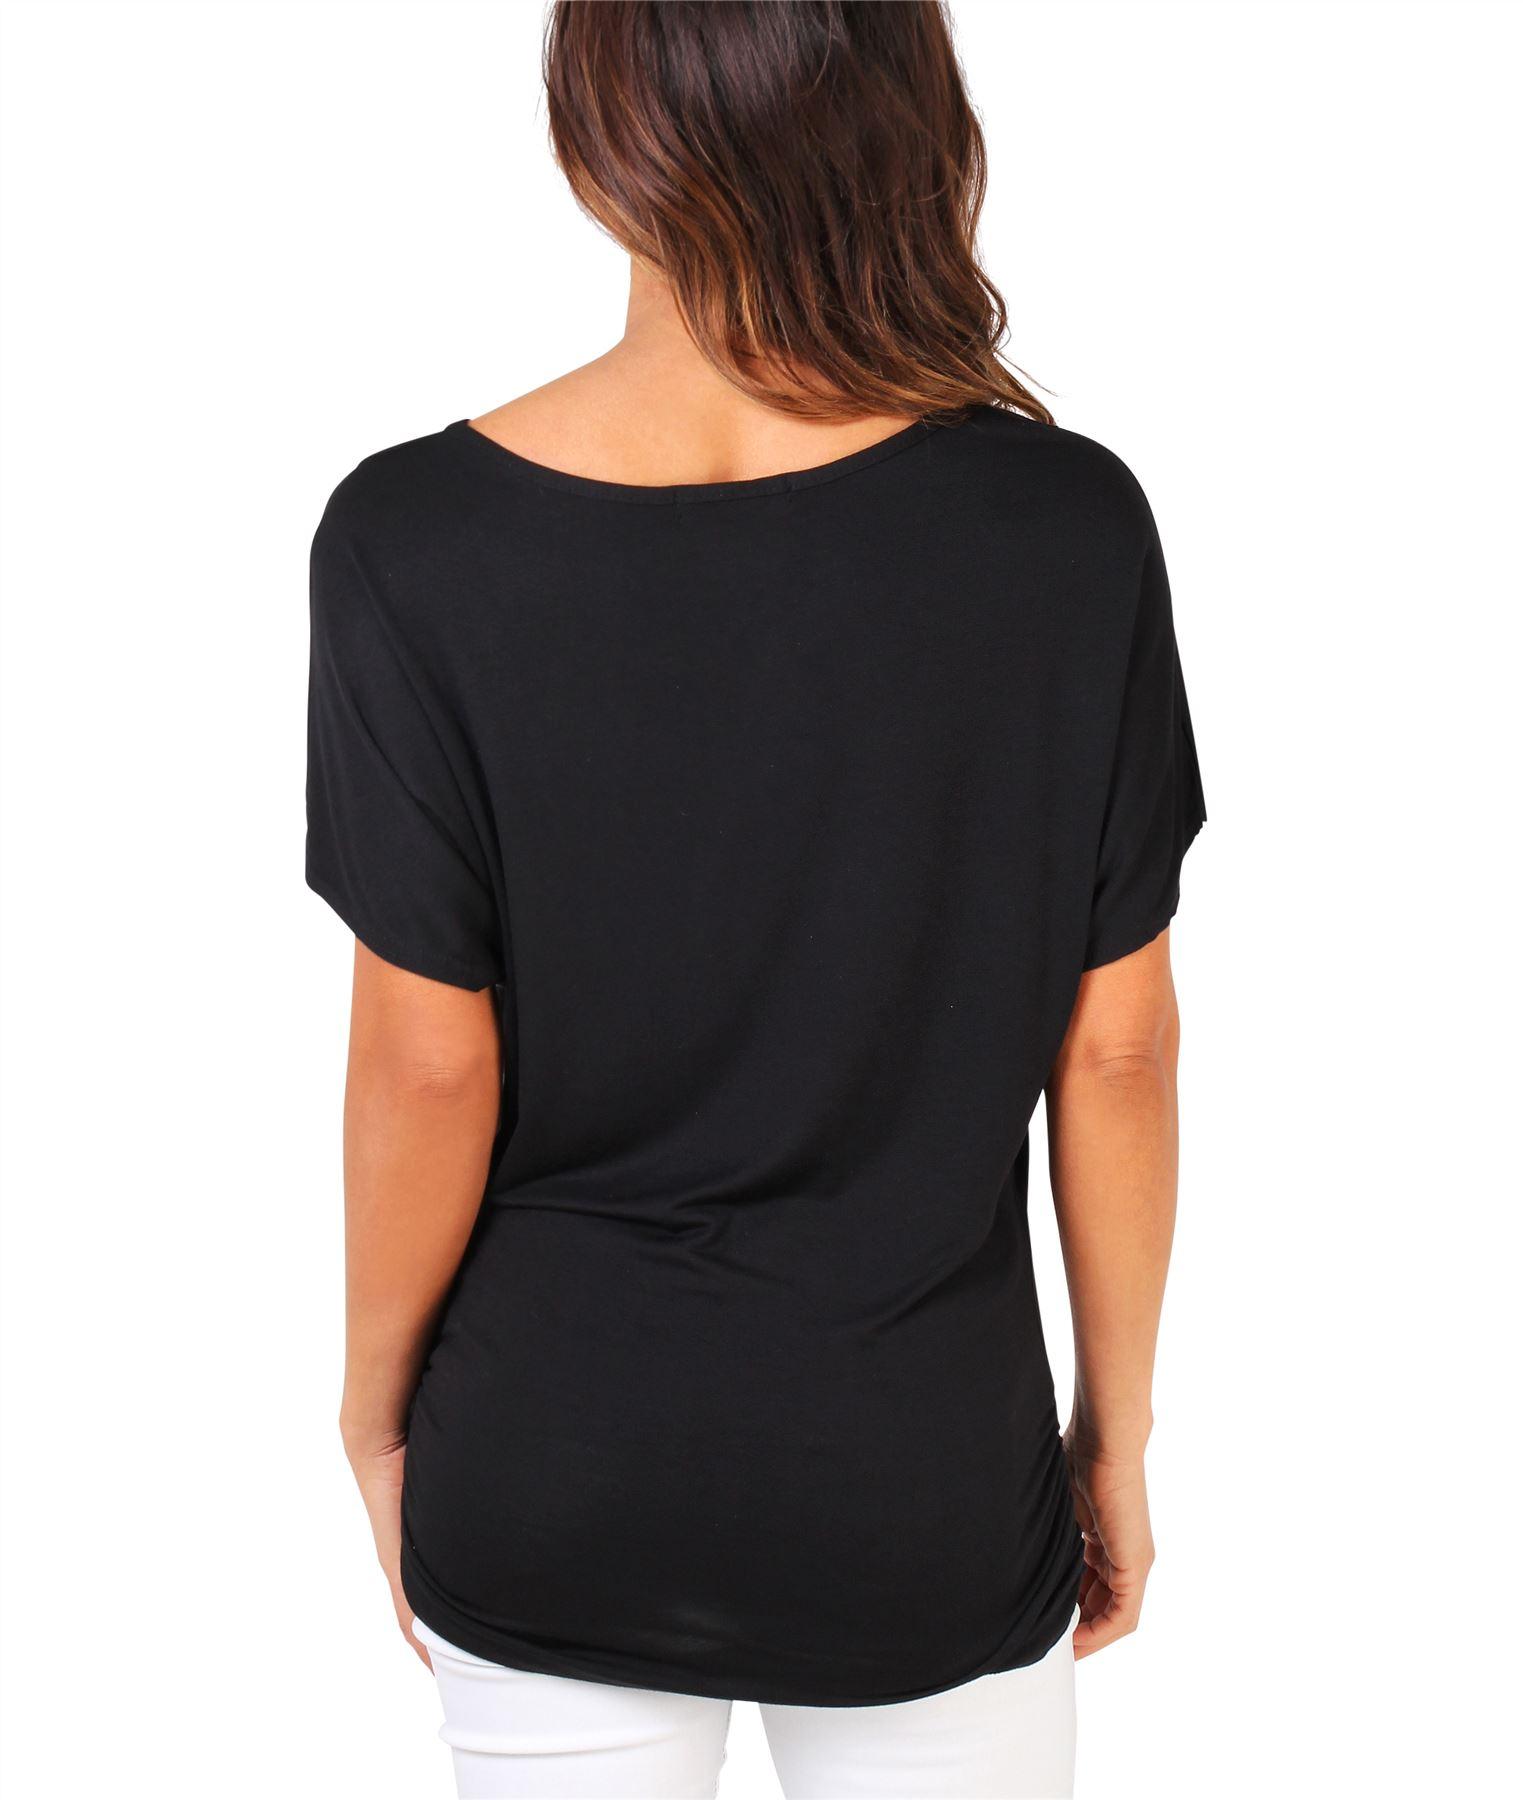 Womens-Oversized-Batwing-T-Shirt-Ladies-Baggy-Animal-Tiger-Blouse-Print-Top thumbnail 3